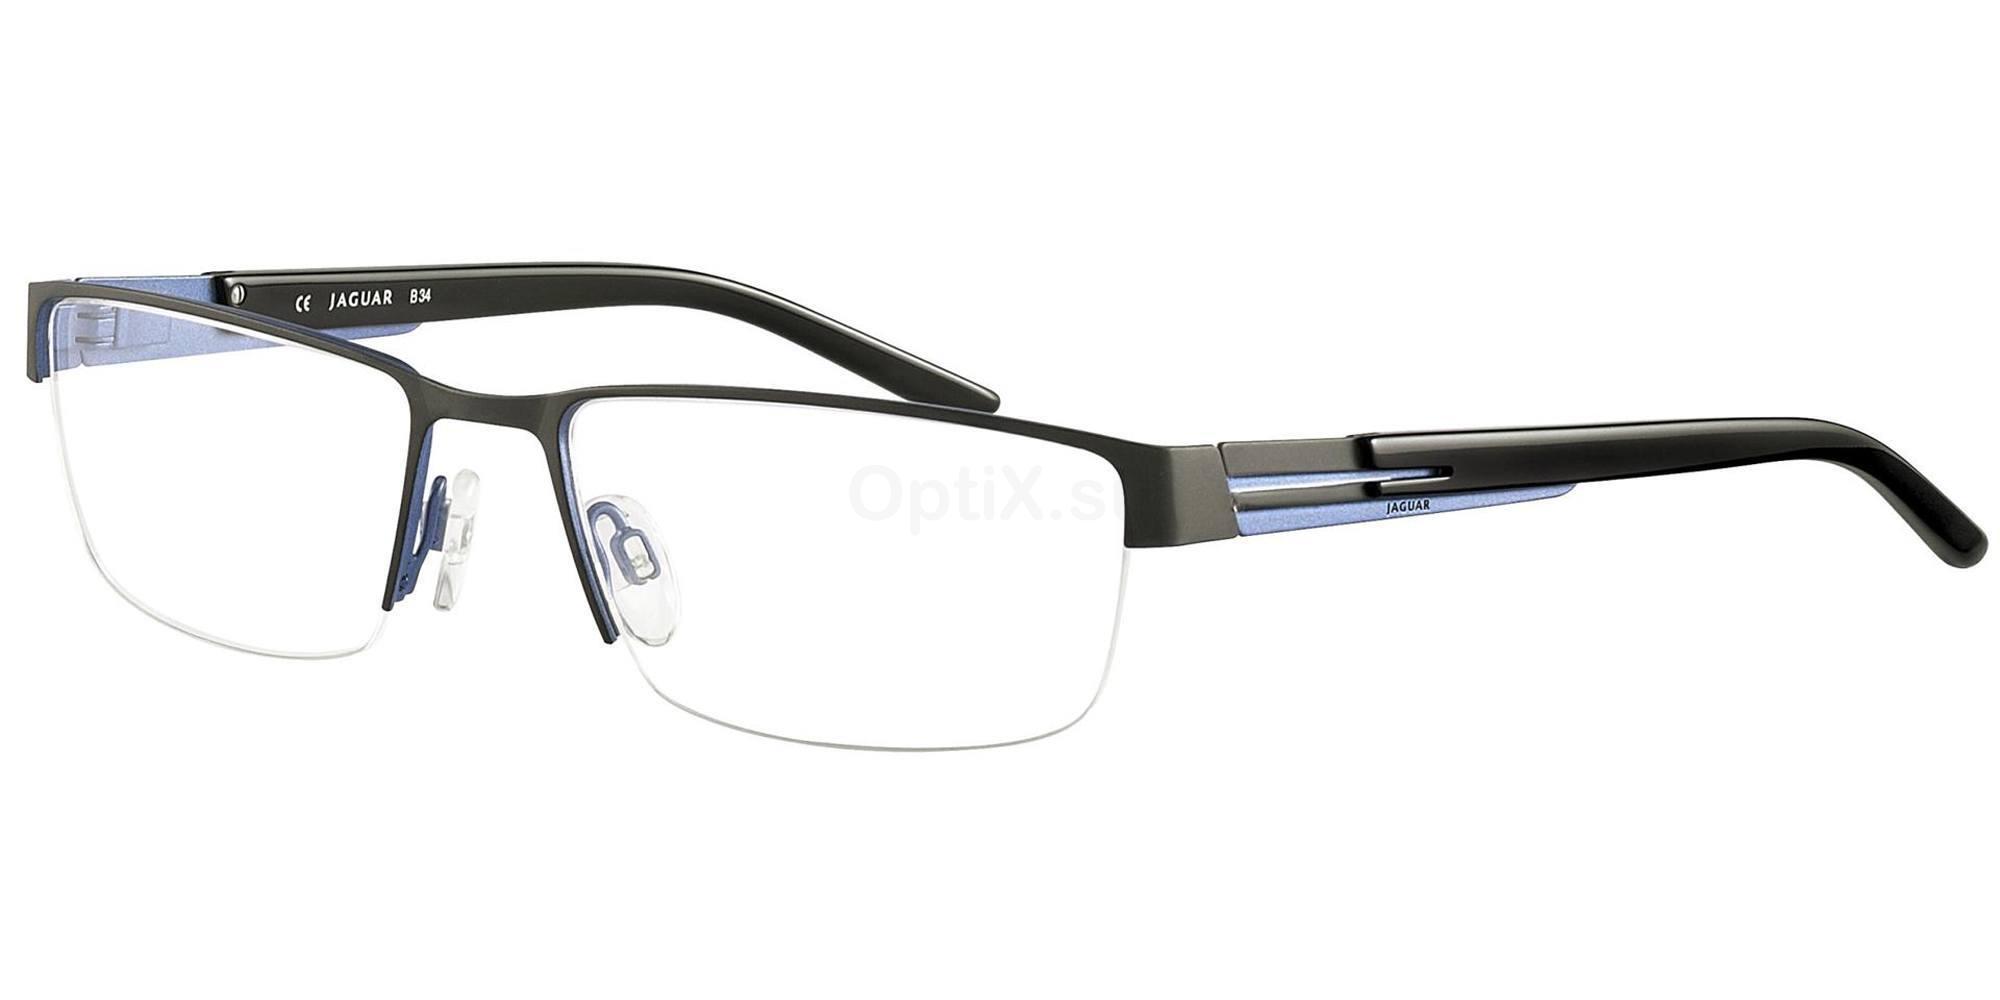 704 33552 Glasses, JAGUAR Eyewear